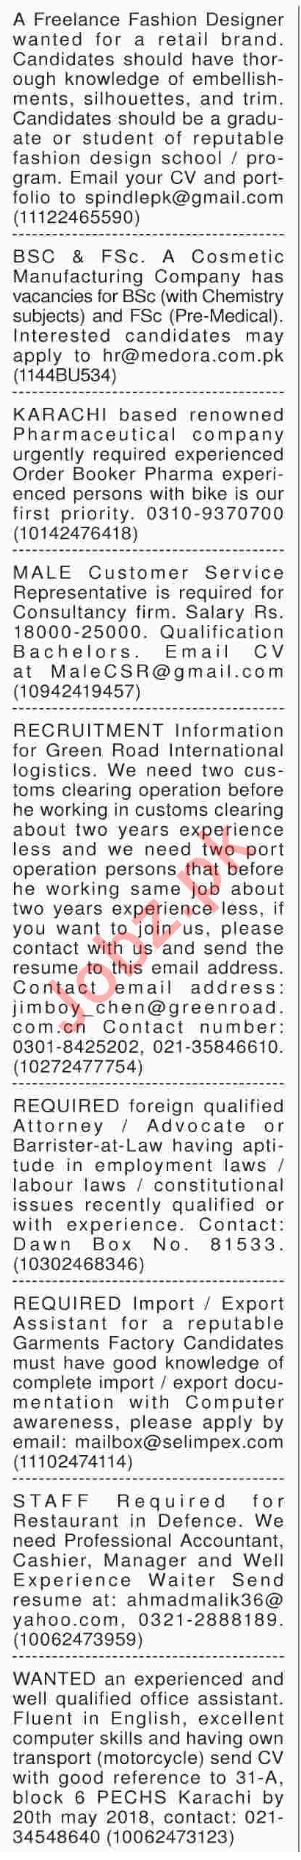 Fashion Designer Wanted For Retail Brand 2020 Job Advertisement Pakistan